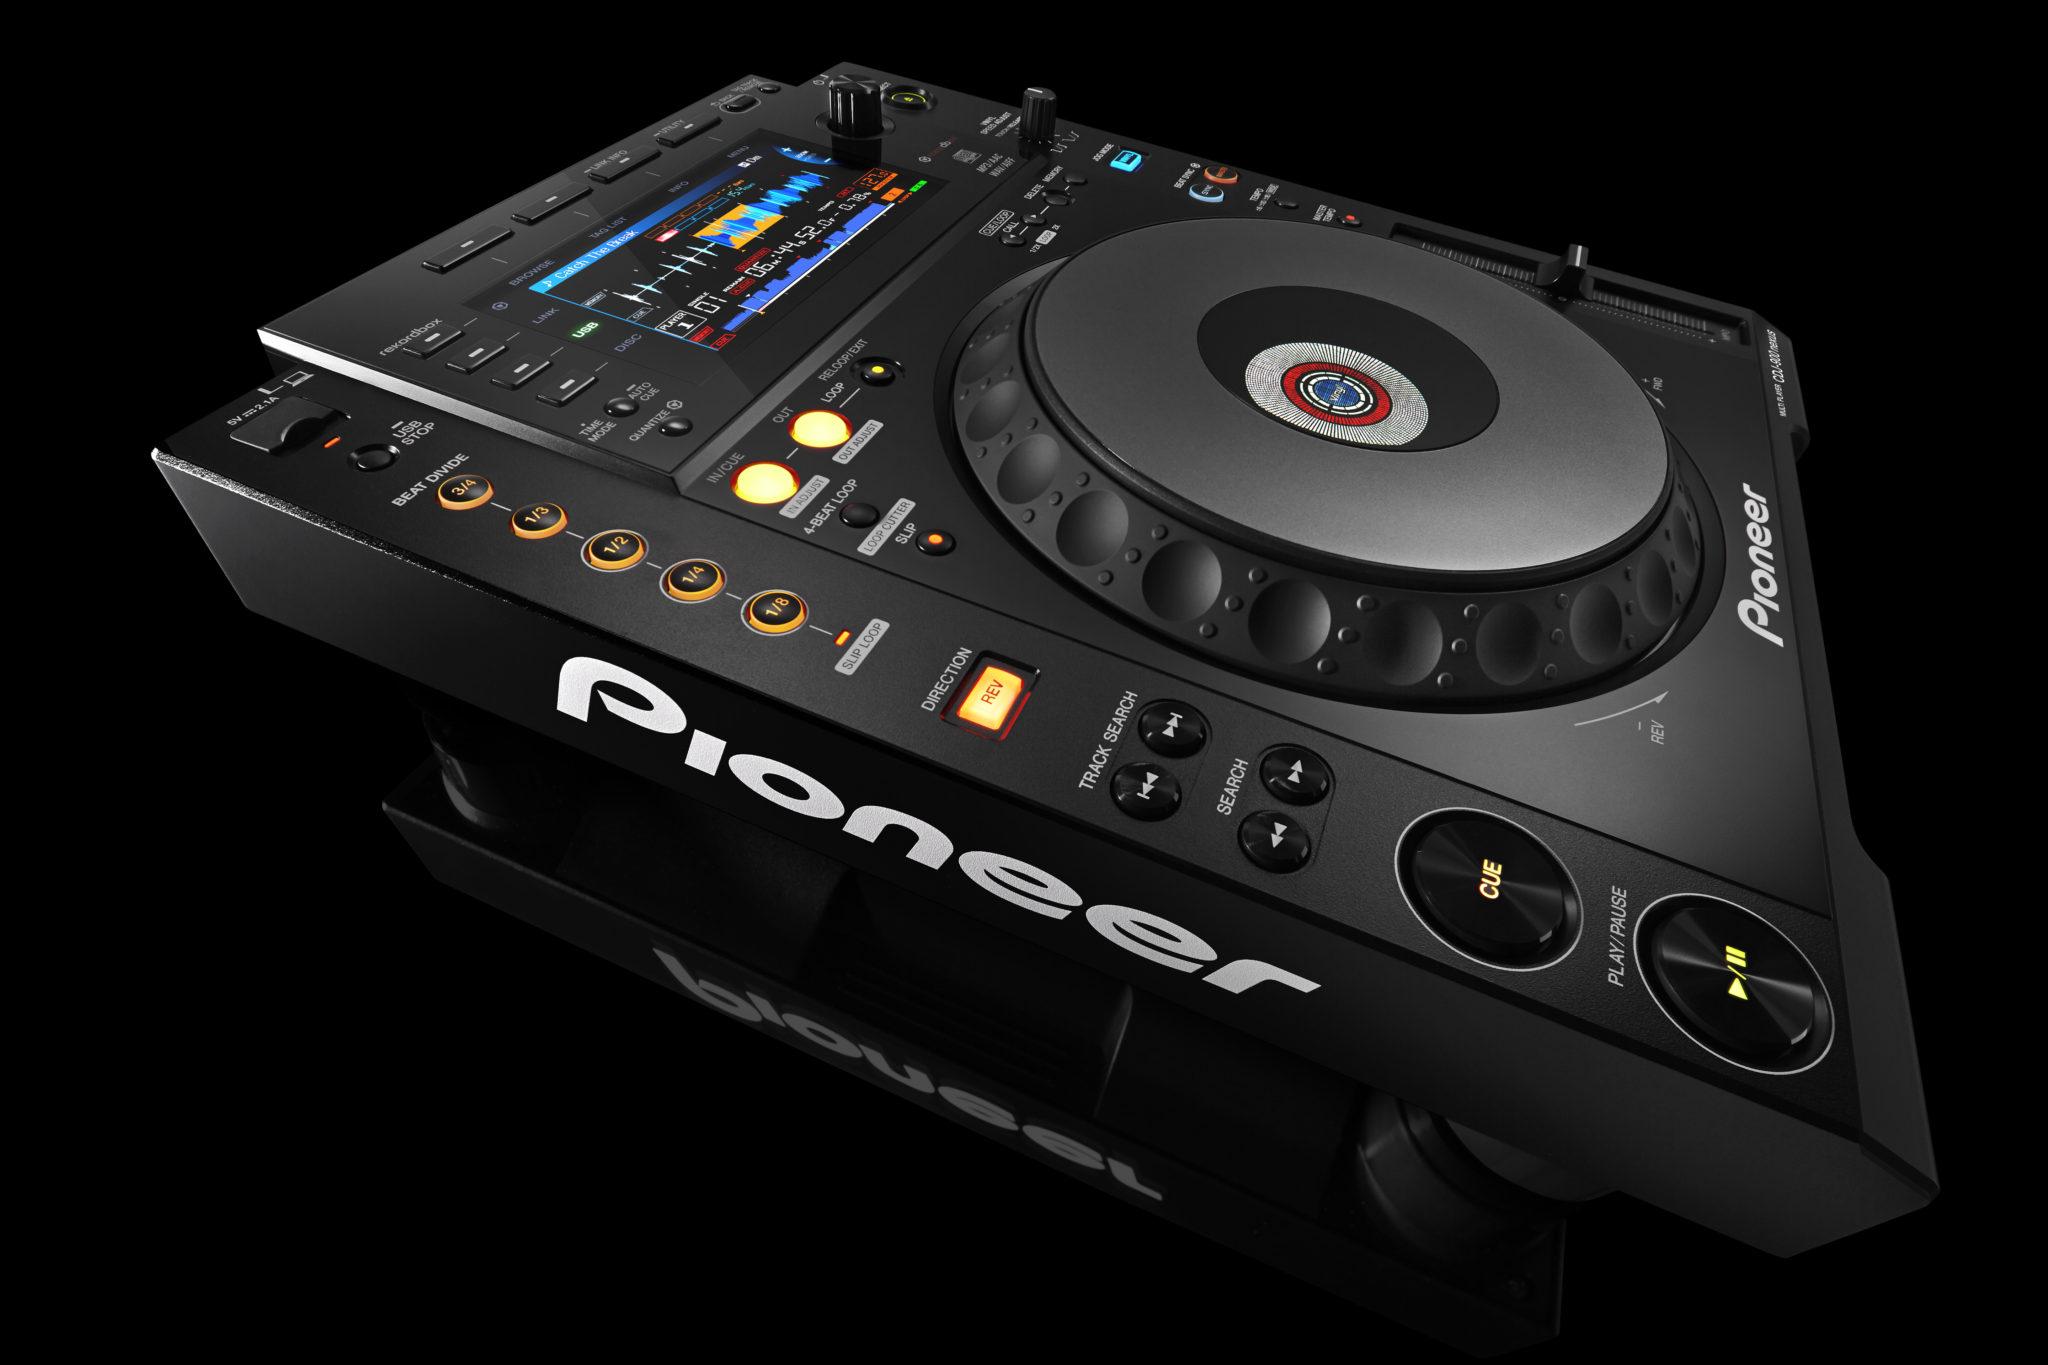 CDJ-900NXS Pro-DJ multi-player (black) - Pioneer DJ